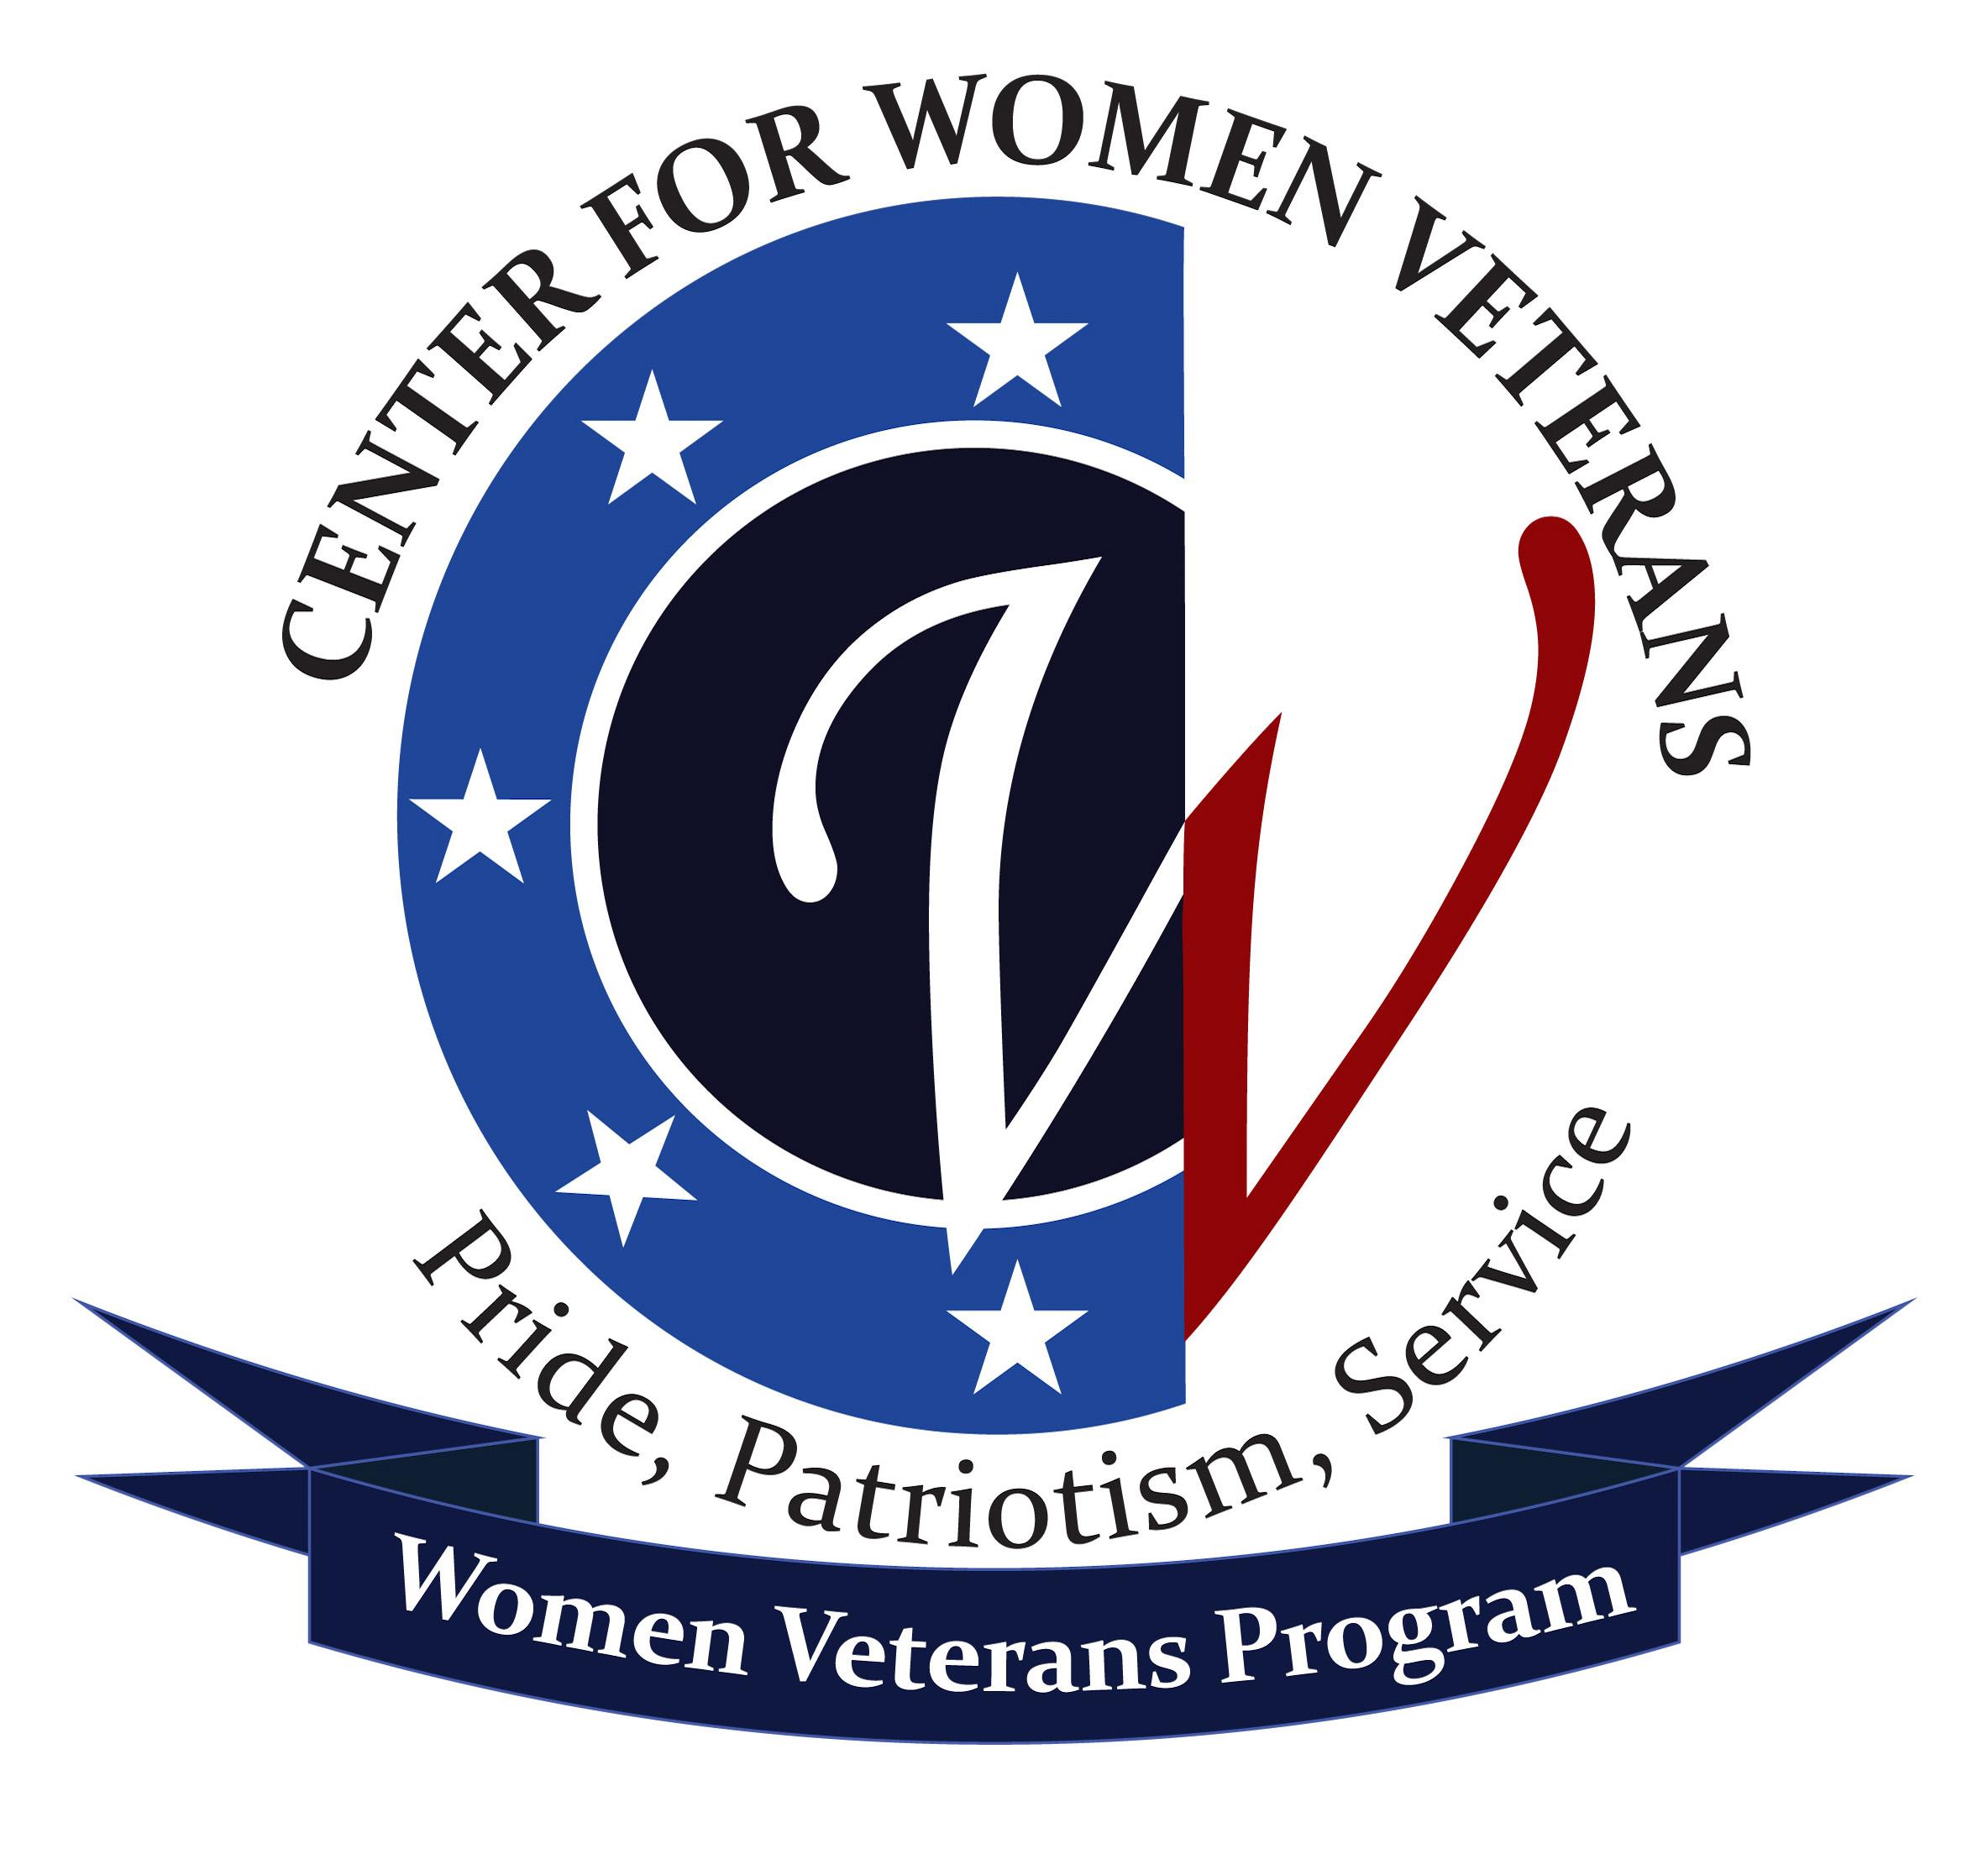 CWV logo (3) (002)